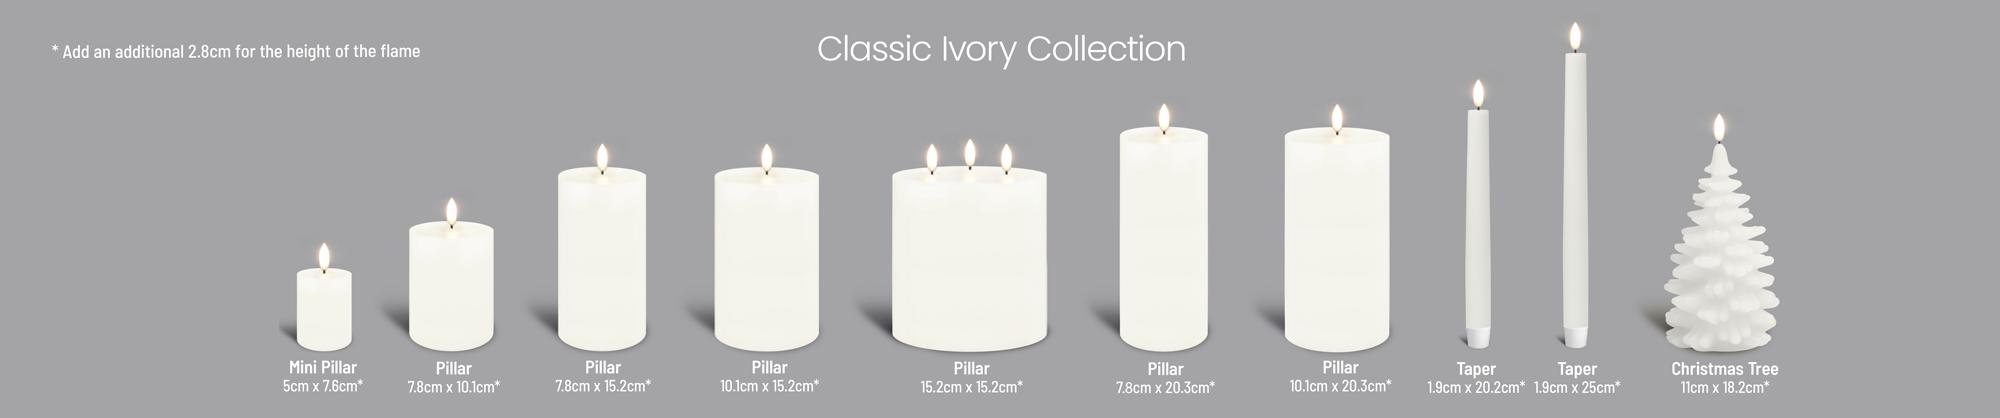 Uyuni Flameless Candle Collection Ivory